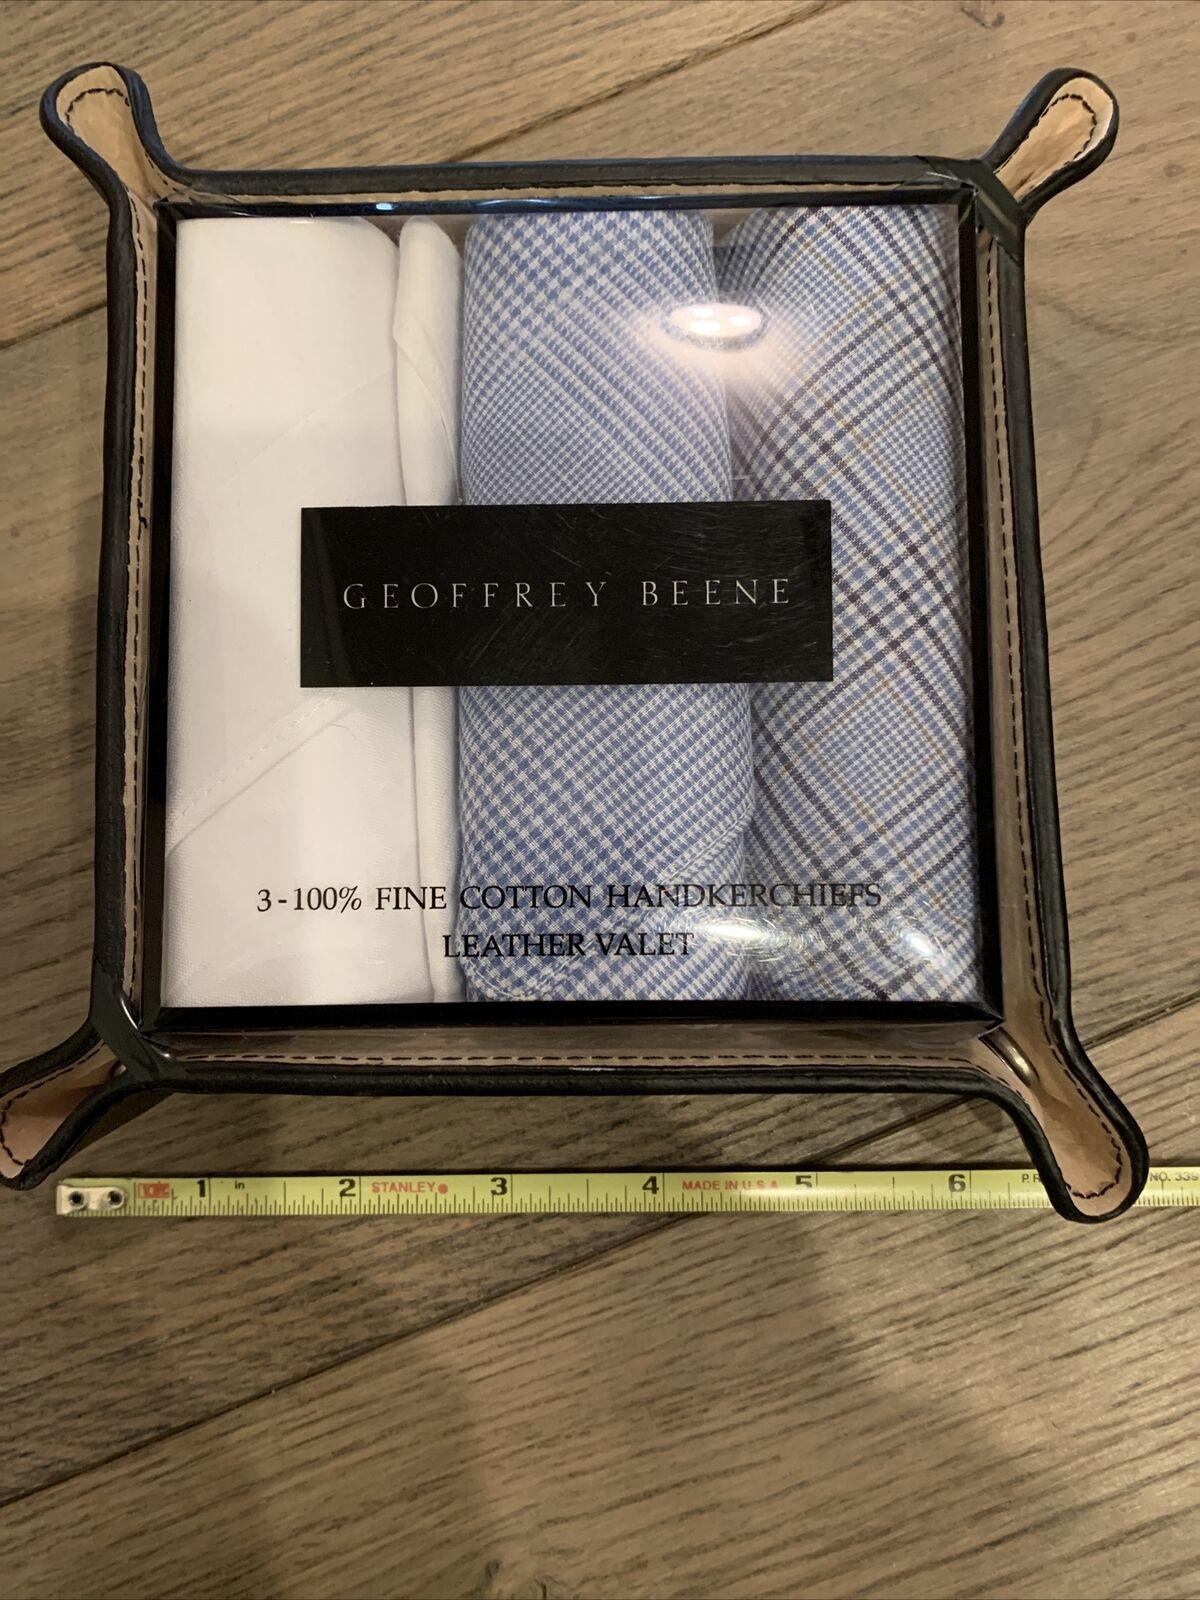 Geoffrey Beene Handkerchiefs In Leather Valet New Great Gift 100% Fine Cotton